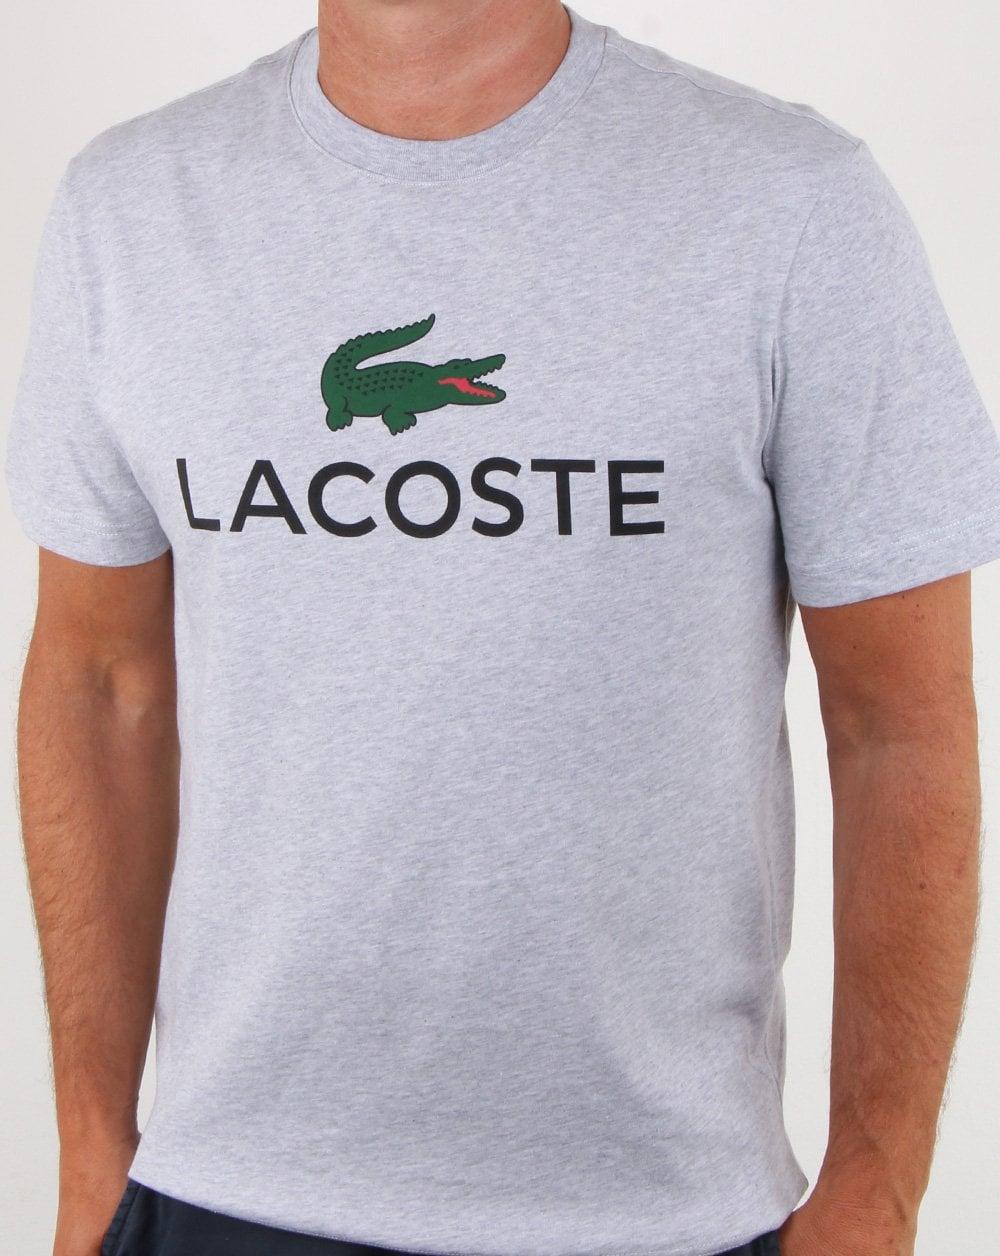 5cfa23551 Lacoste Logo T-shirt Silver Chine, Mens, Tee, Croc, Smart, Cotton,Crew